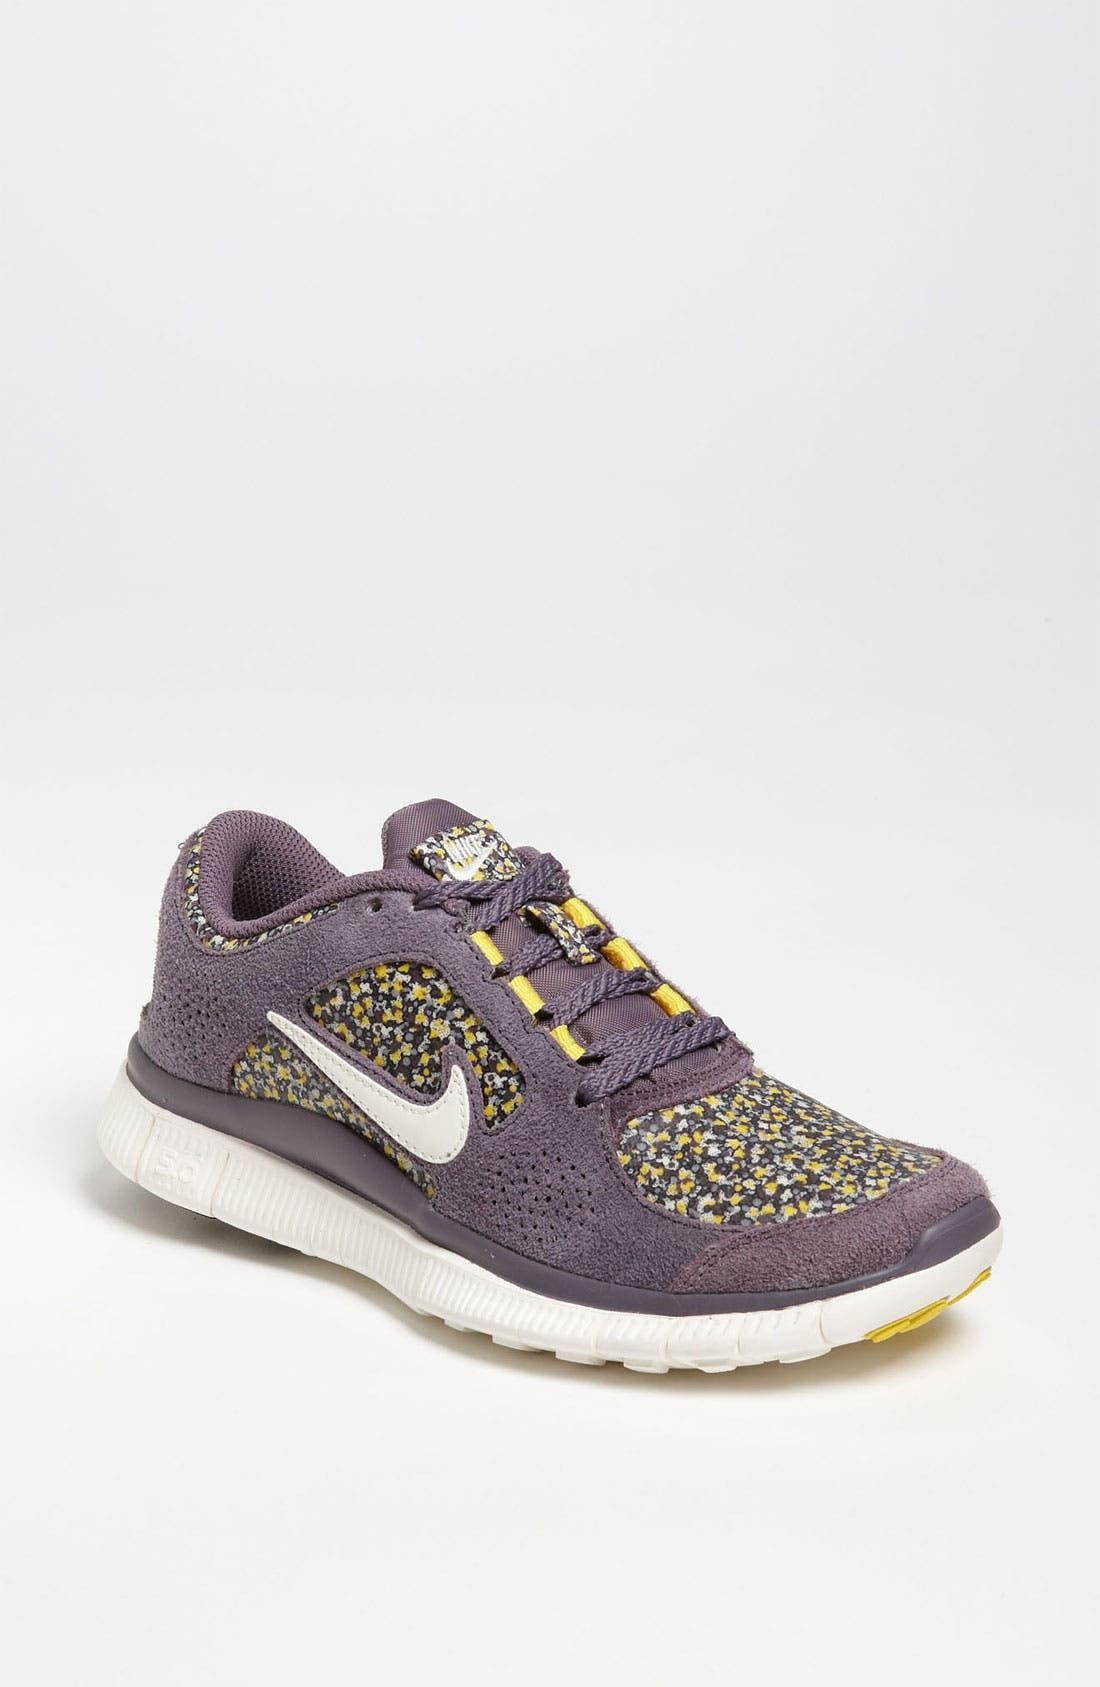 Main Image - Nike 'Free Run 3 Liberty' Sneaker (Women)